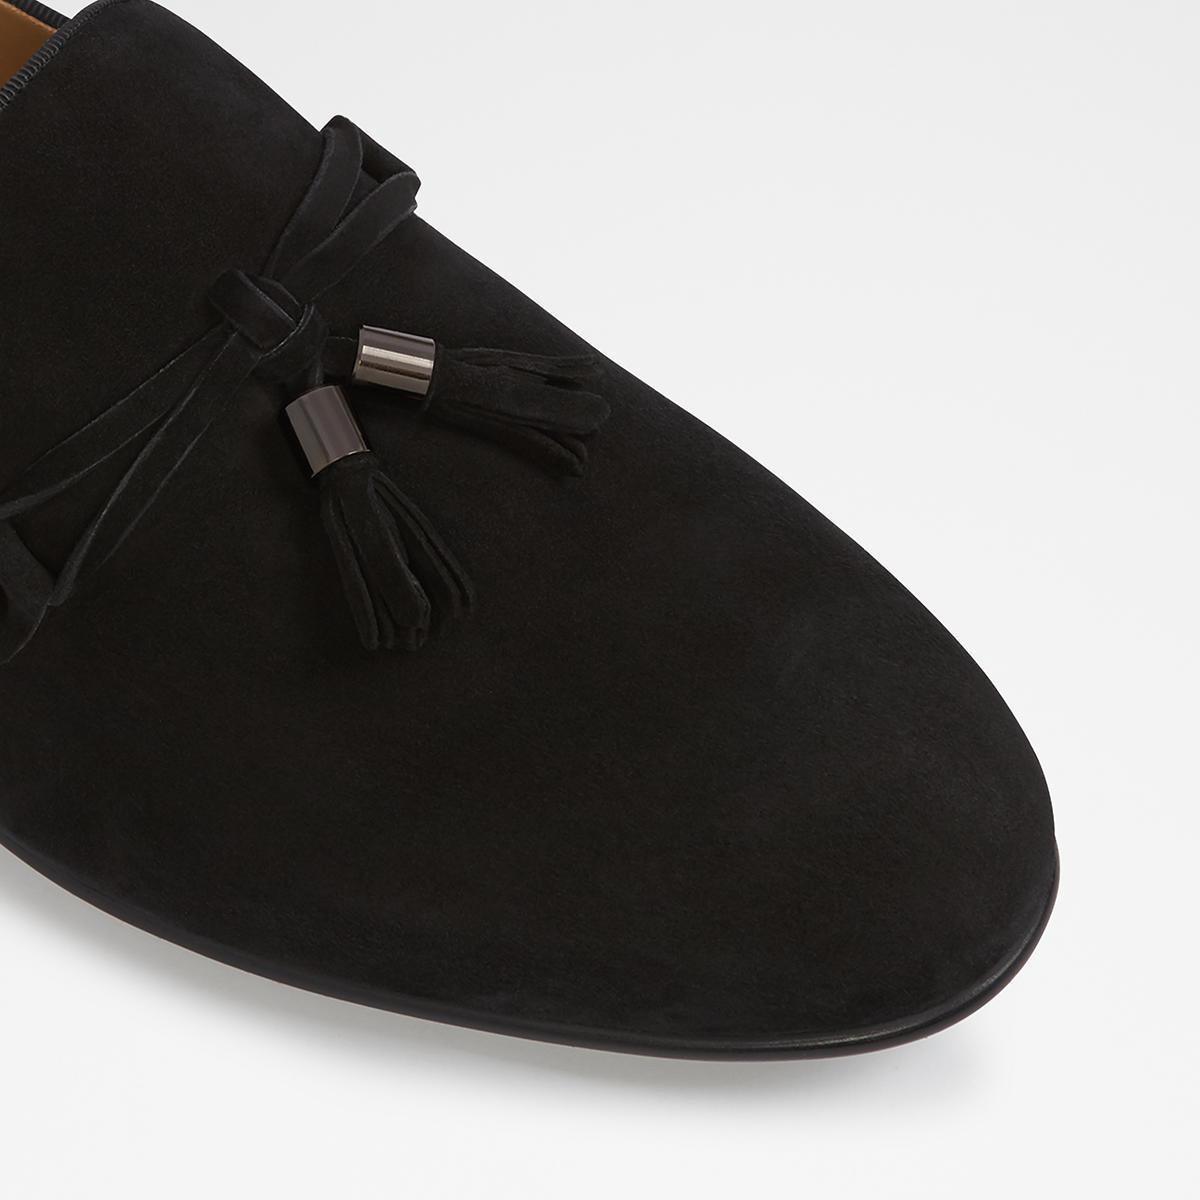 eaf79476510 Mccrery Black Other Men s Loafers